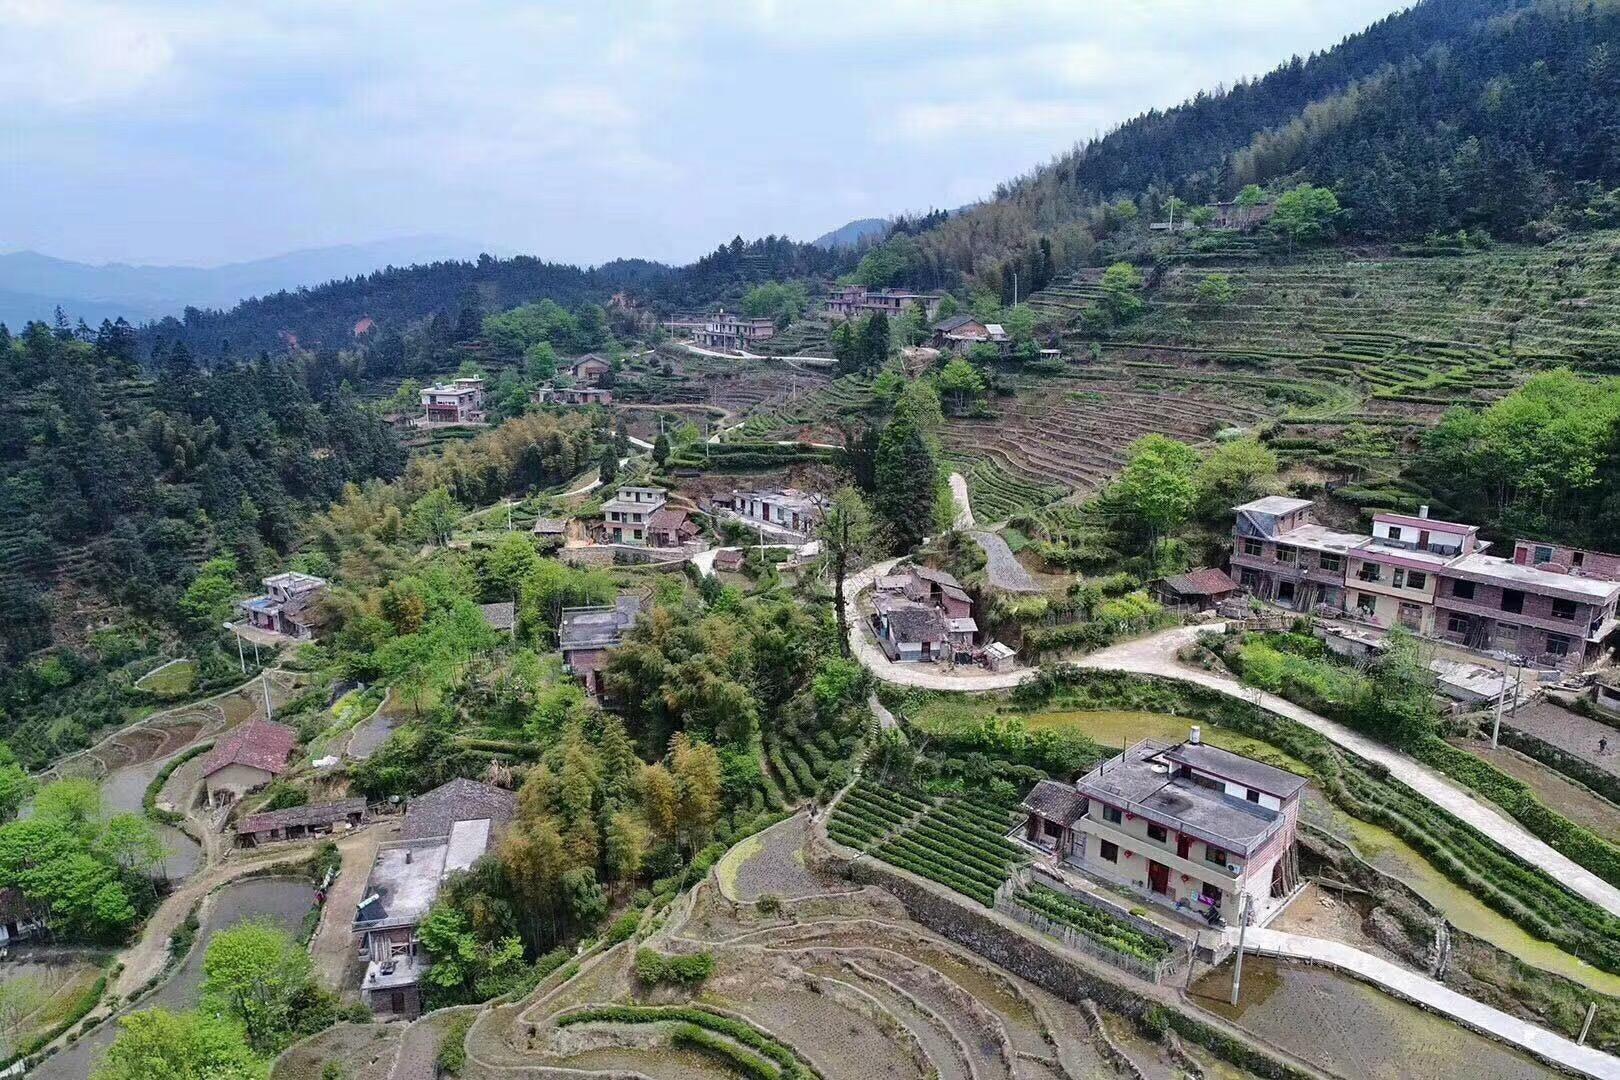 A Beautiful tea village in South Hunan